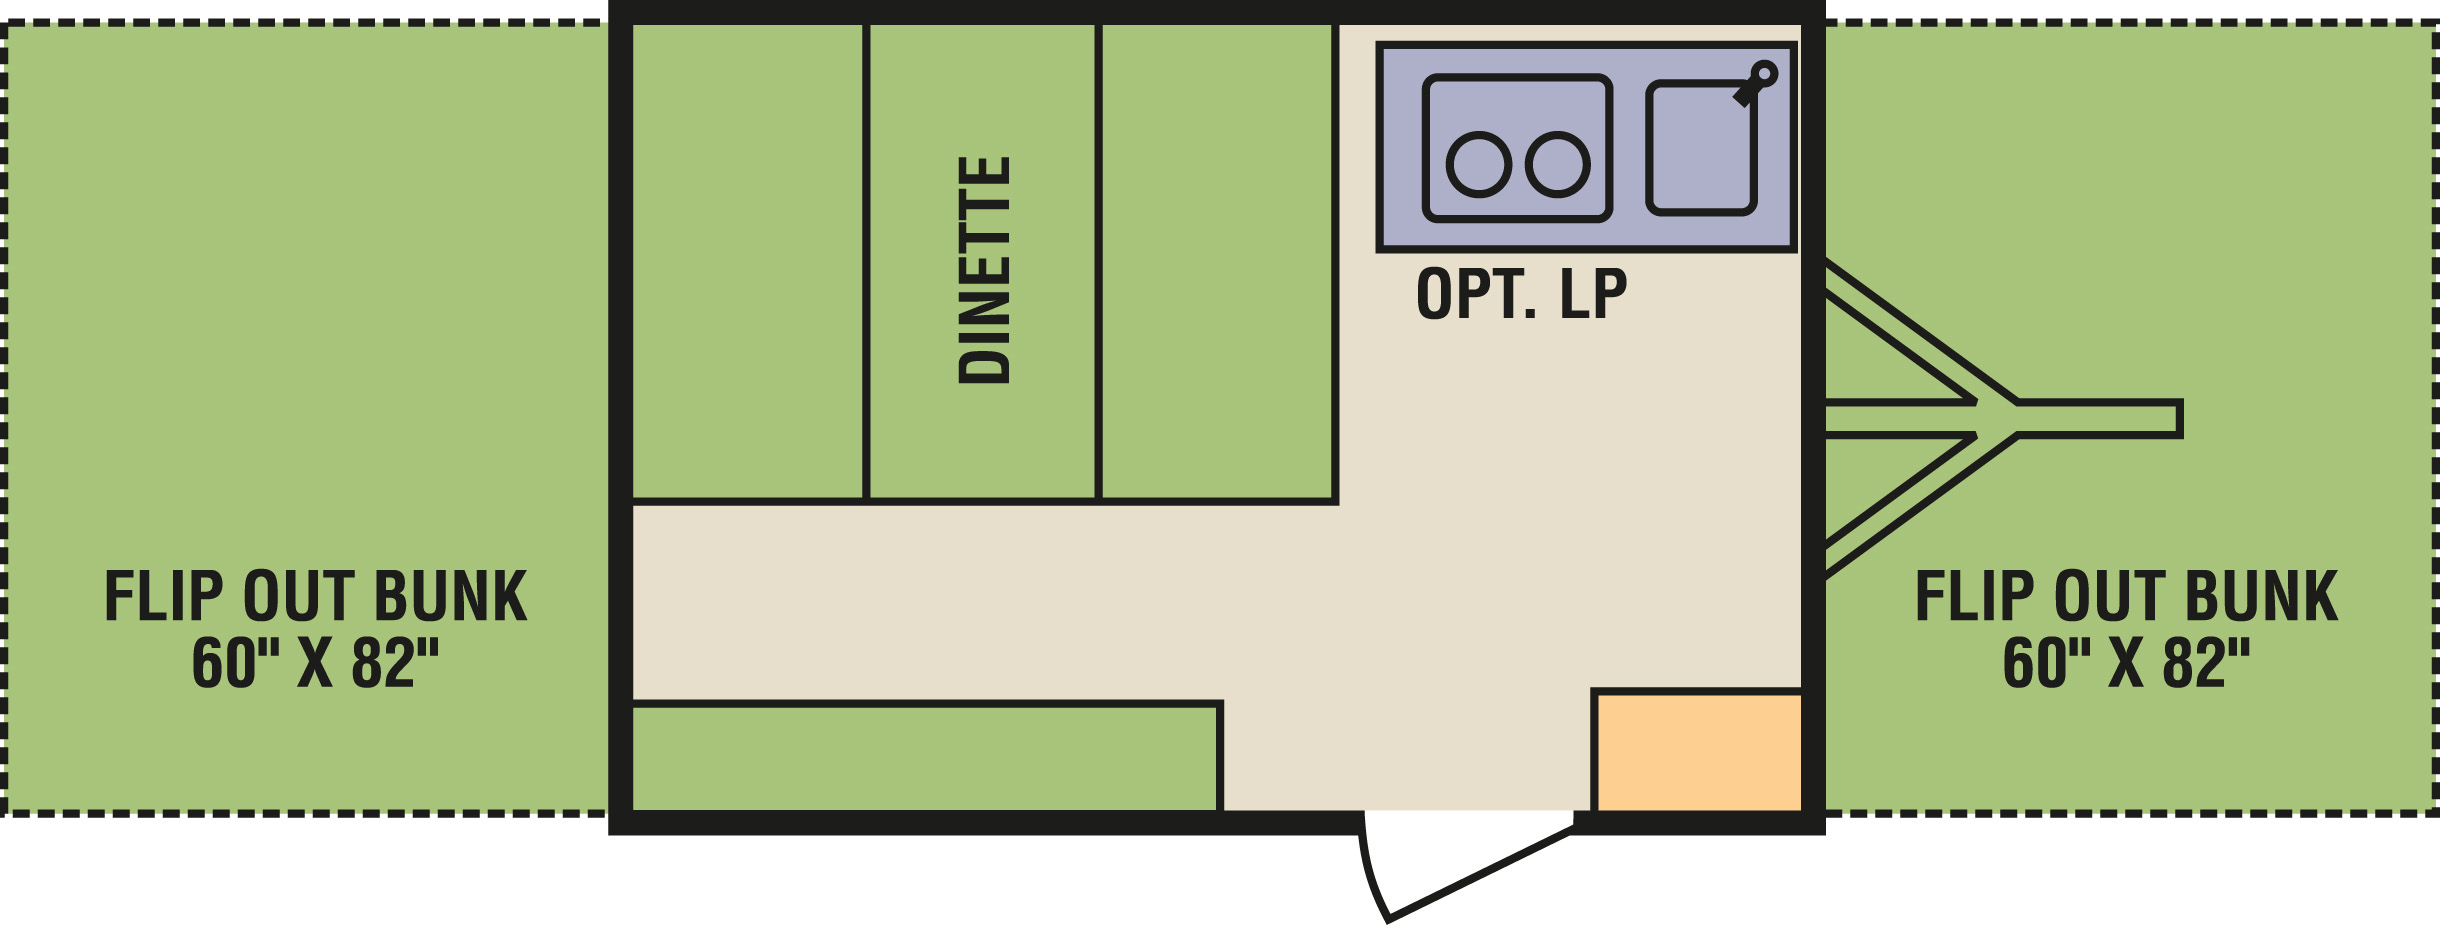 10.0 - Floorplan